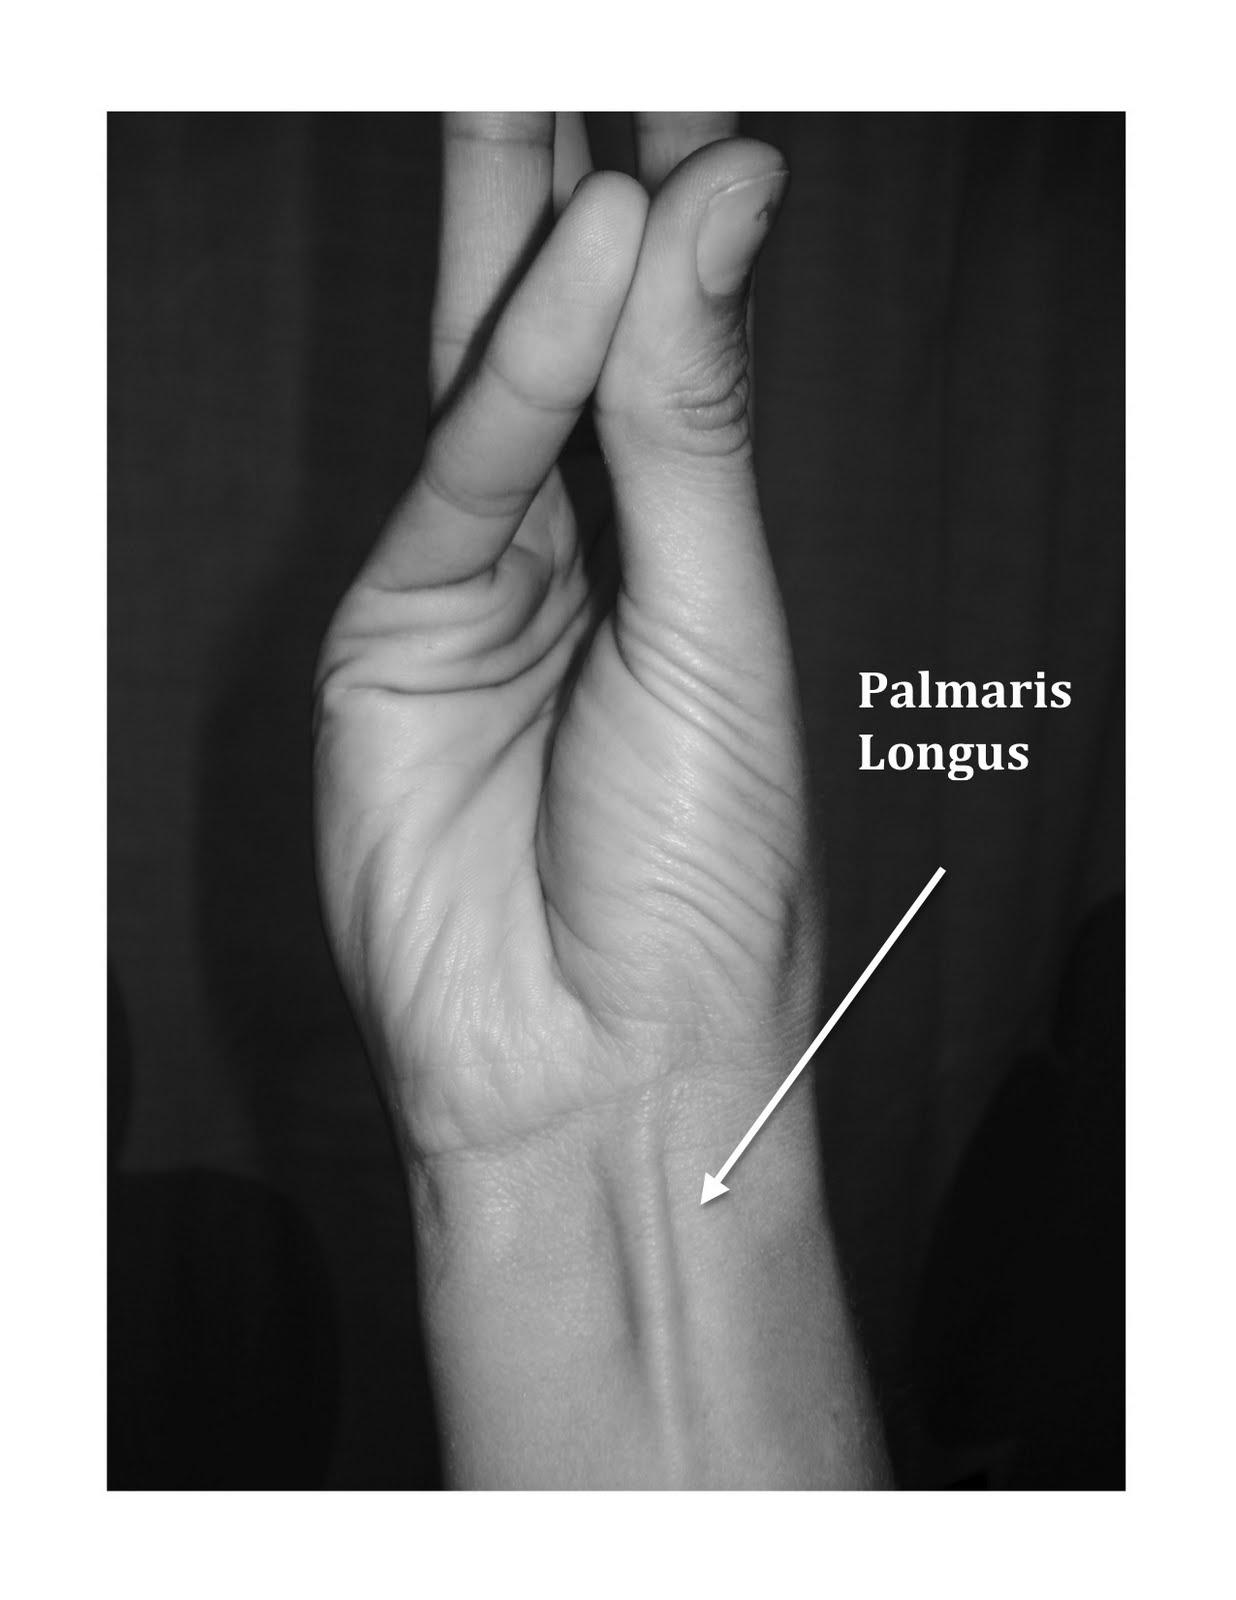 do YOU have a palmaris longus tendon?????